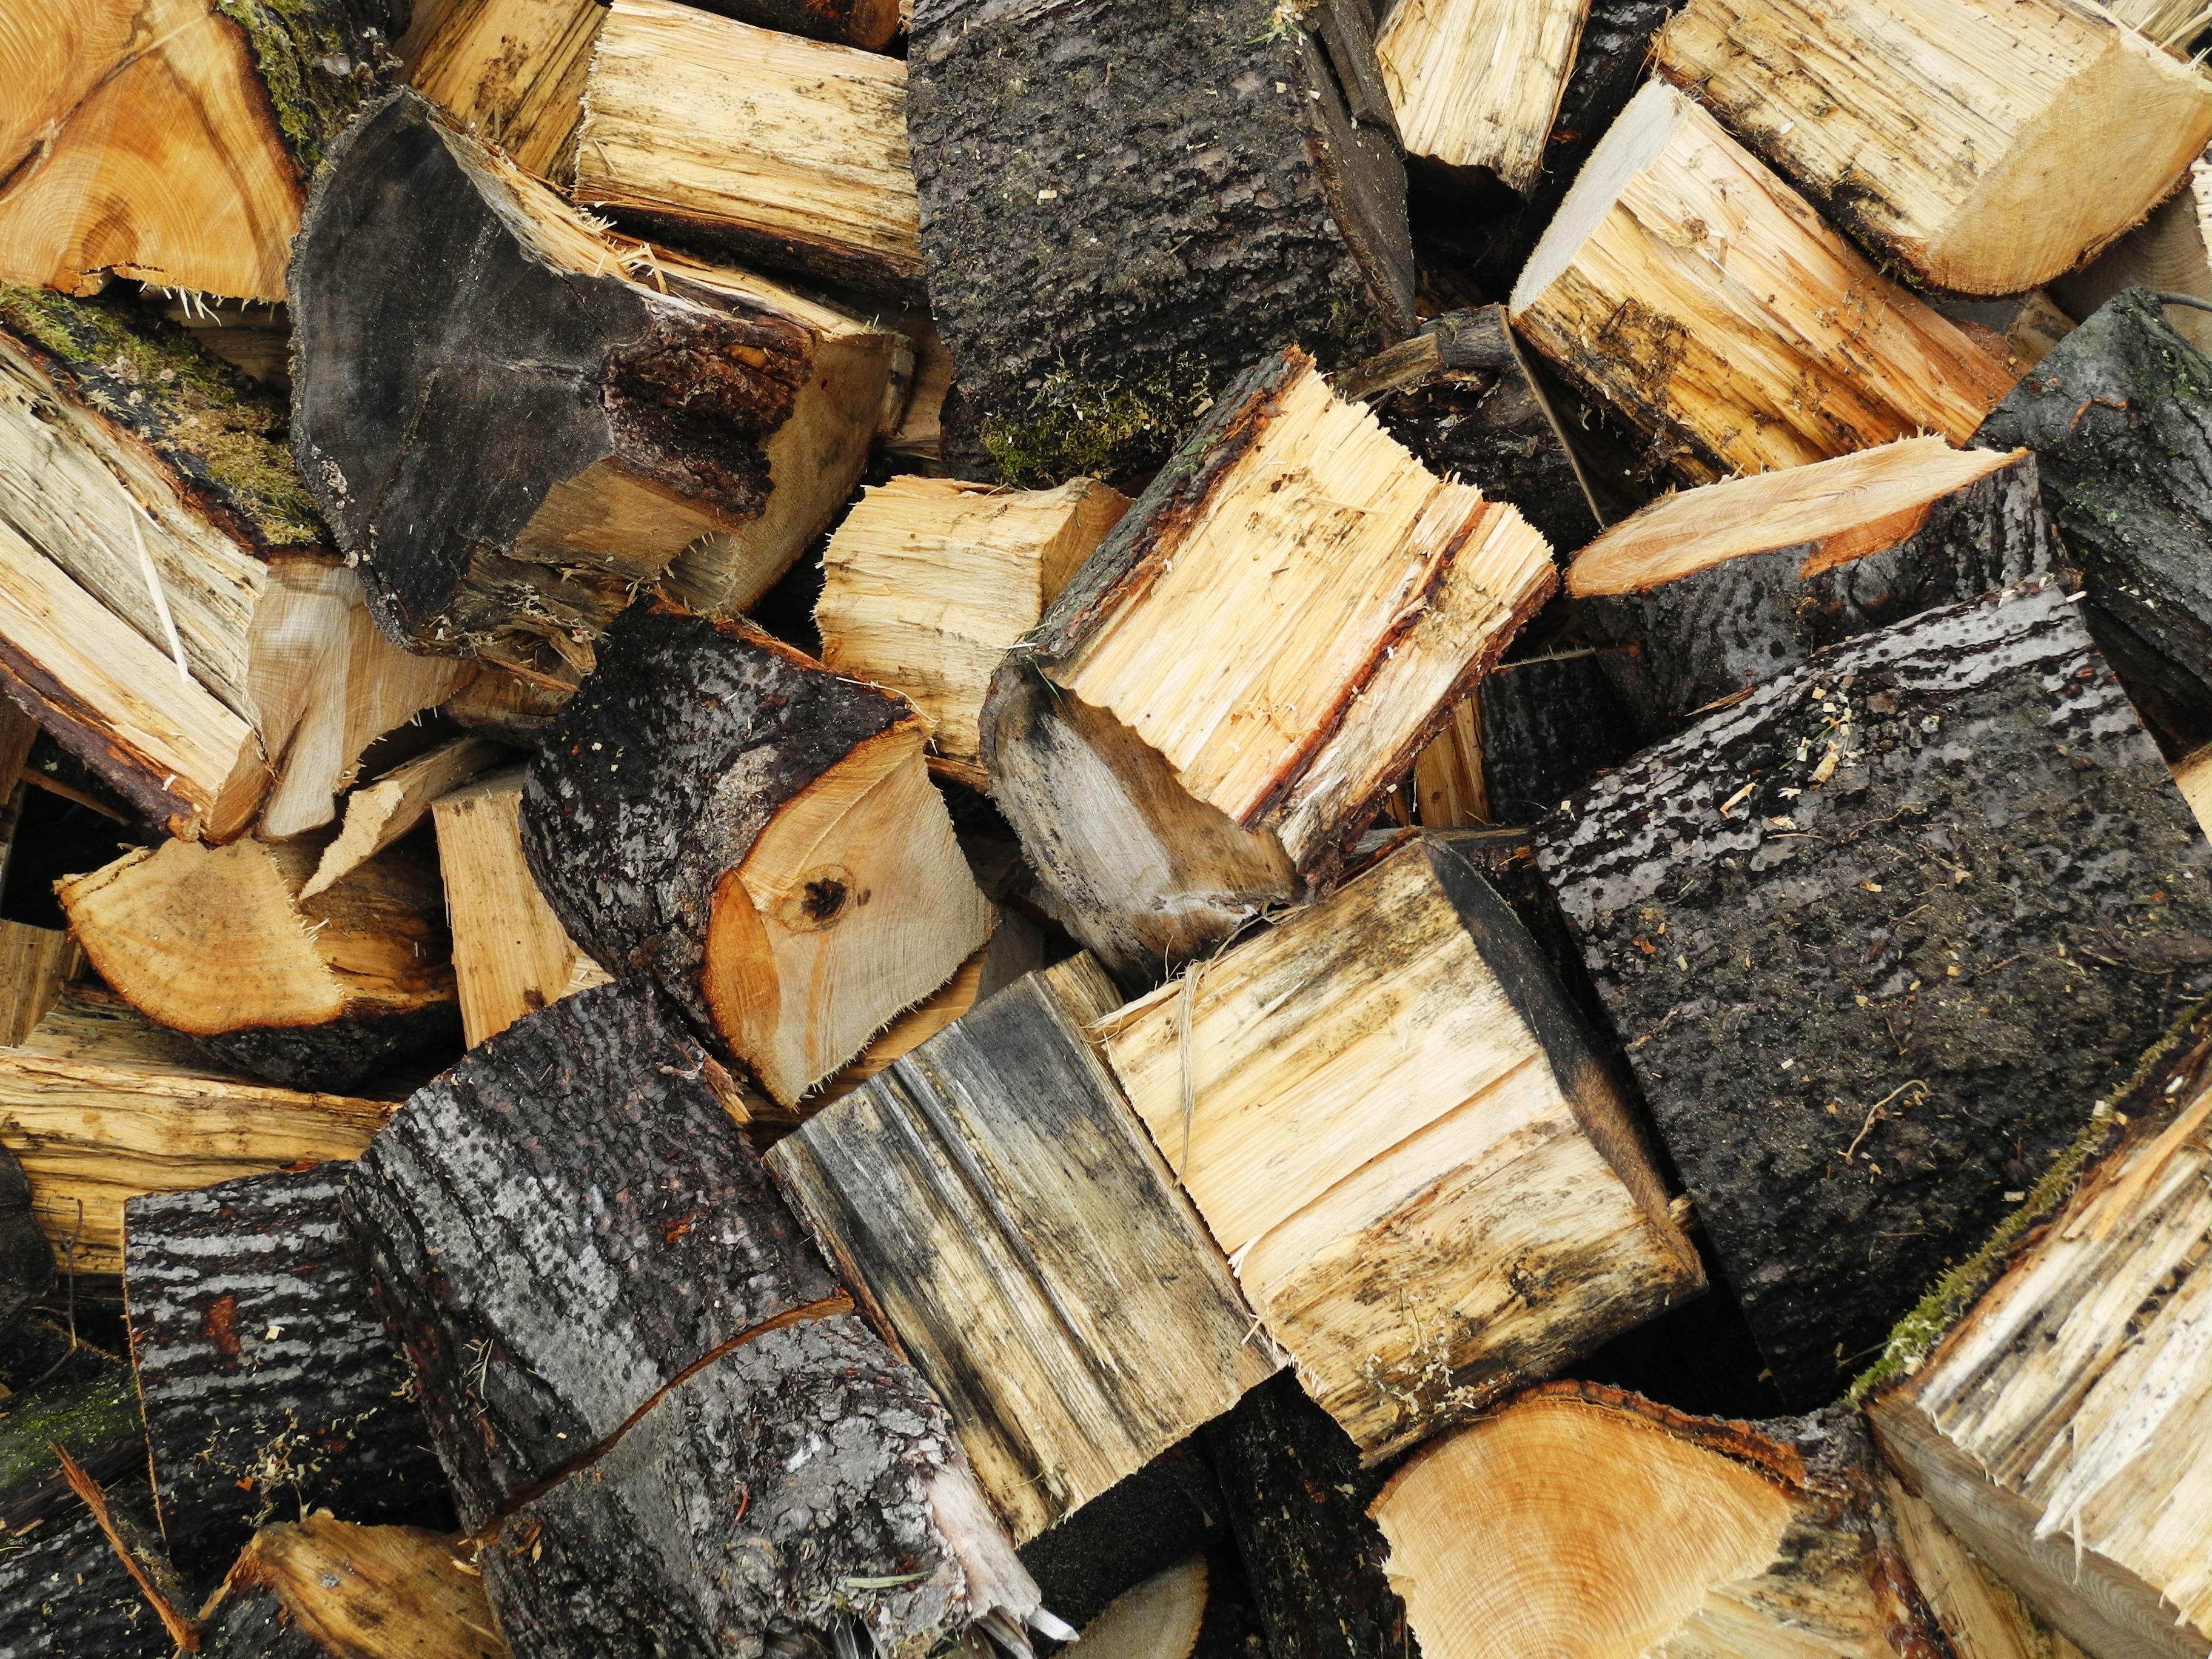 Tree Nature Winter Wood Trunk Bark Autumn Lumber Heat Material Storage Logs  Carving Rings Tree Bark